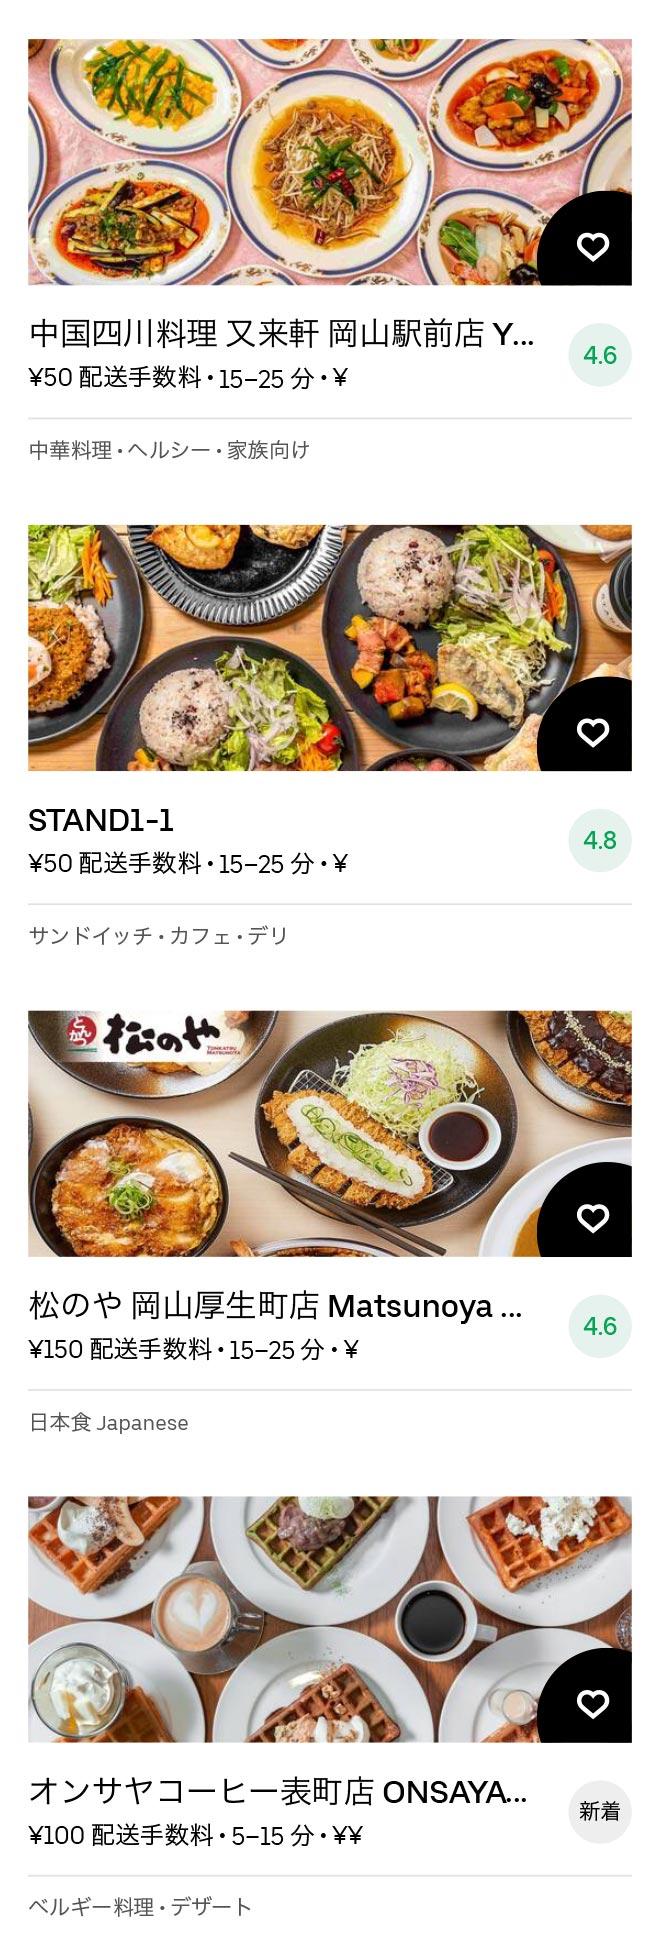 Okayama menu 2011 06